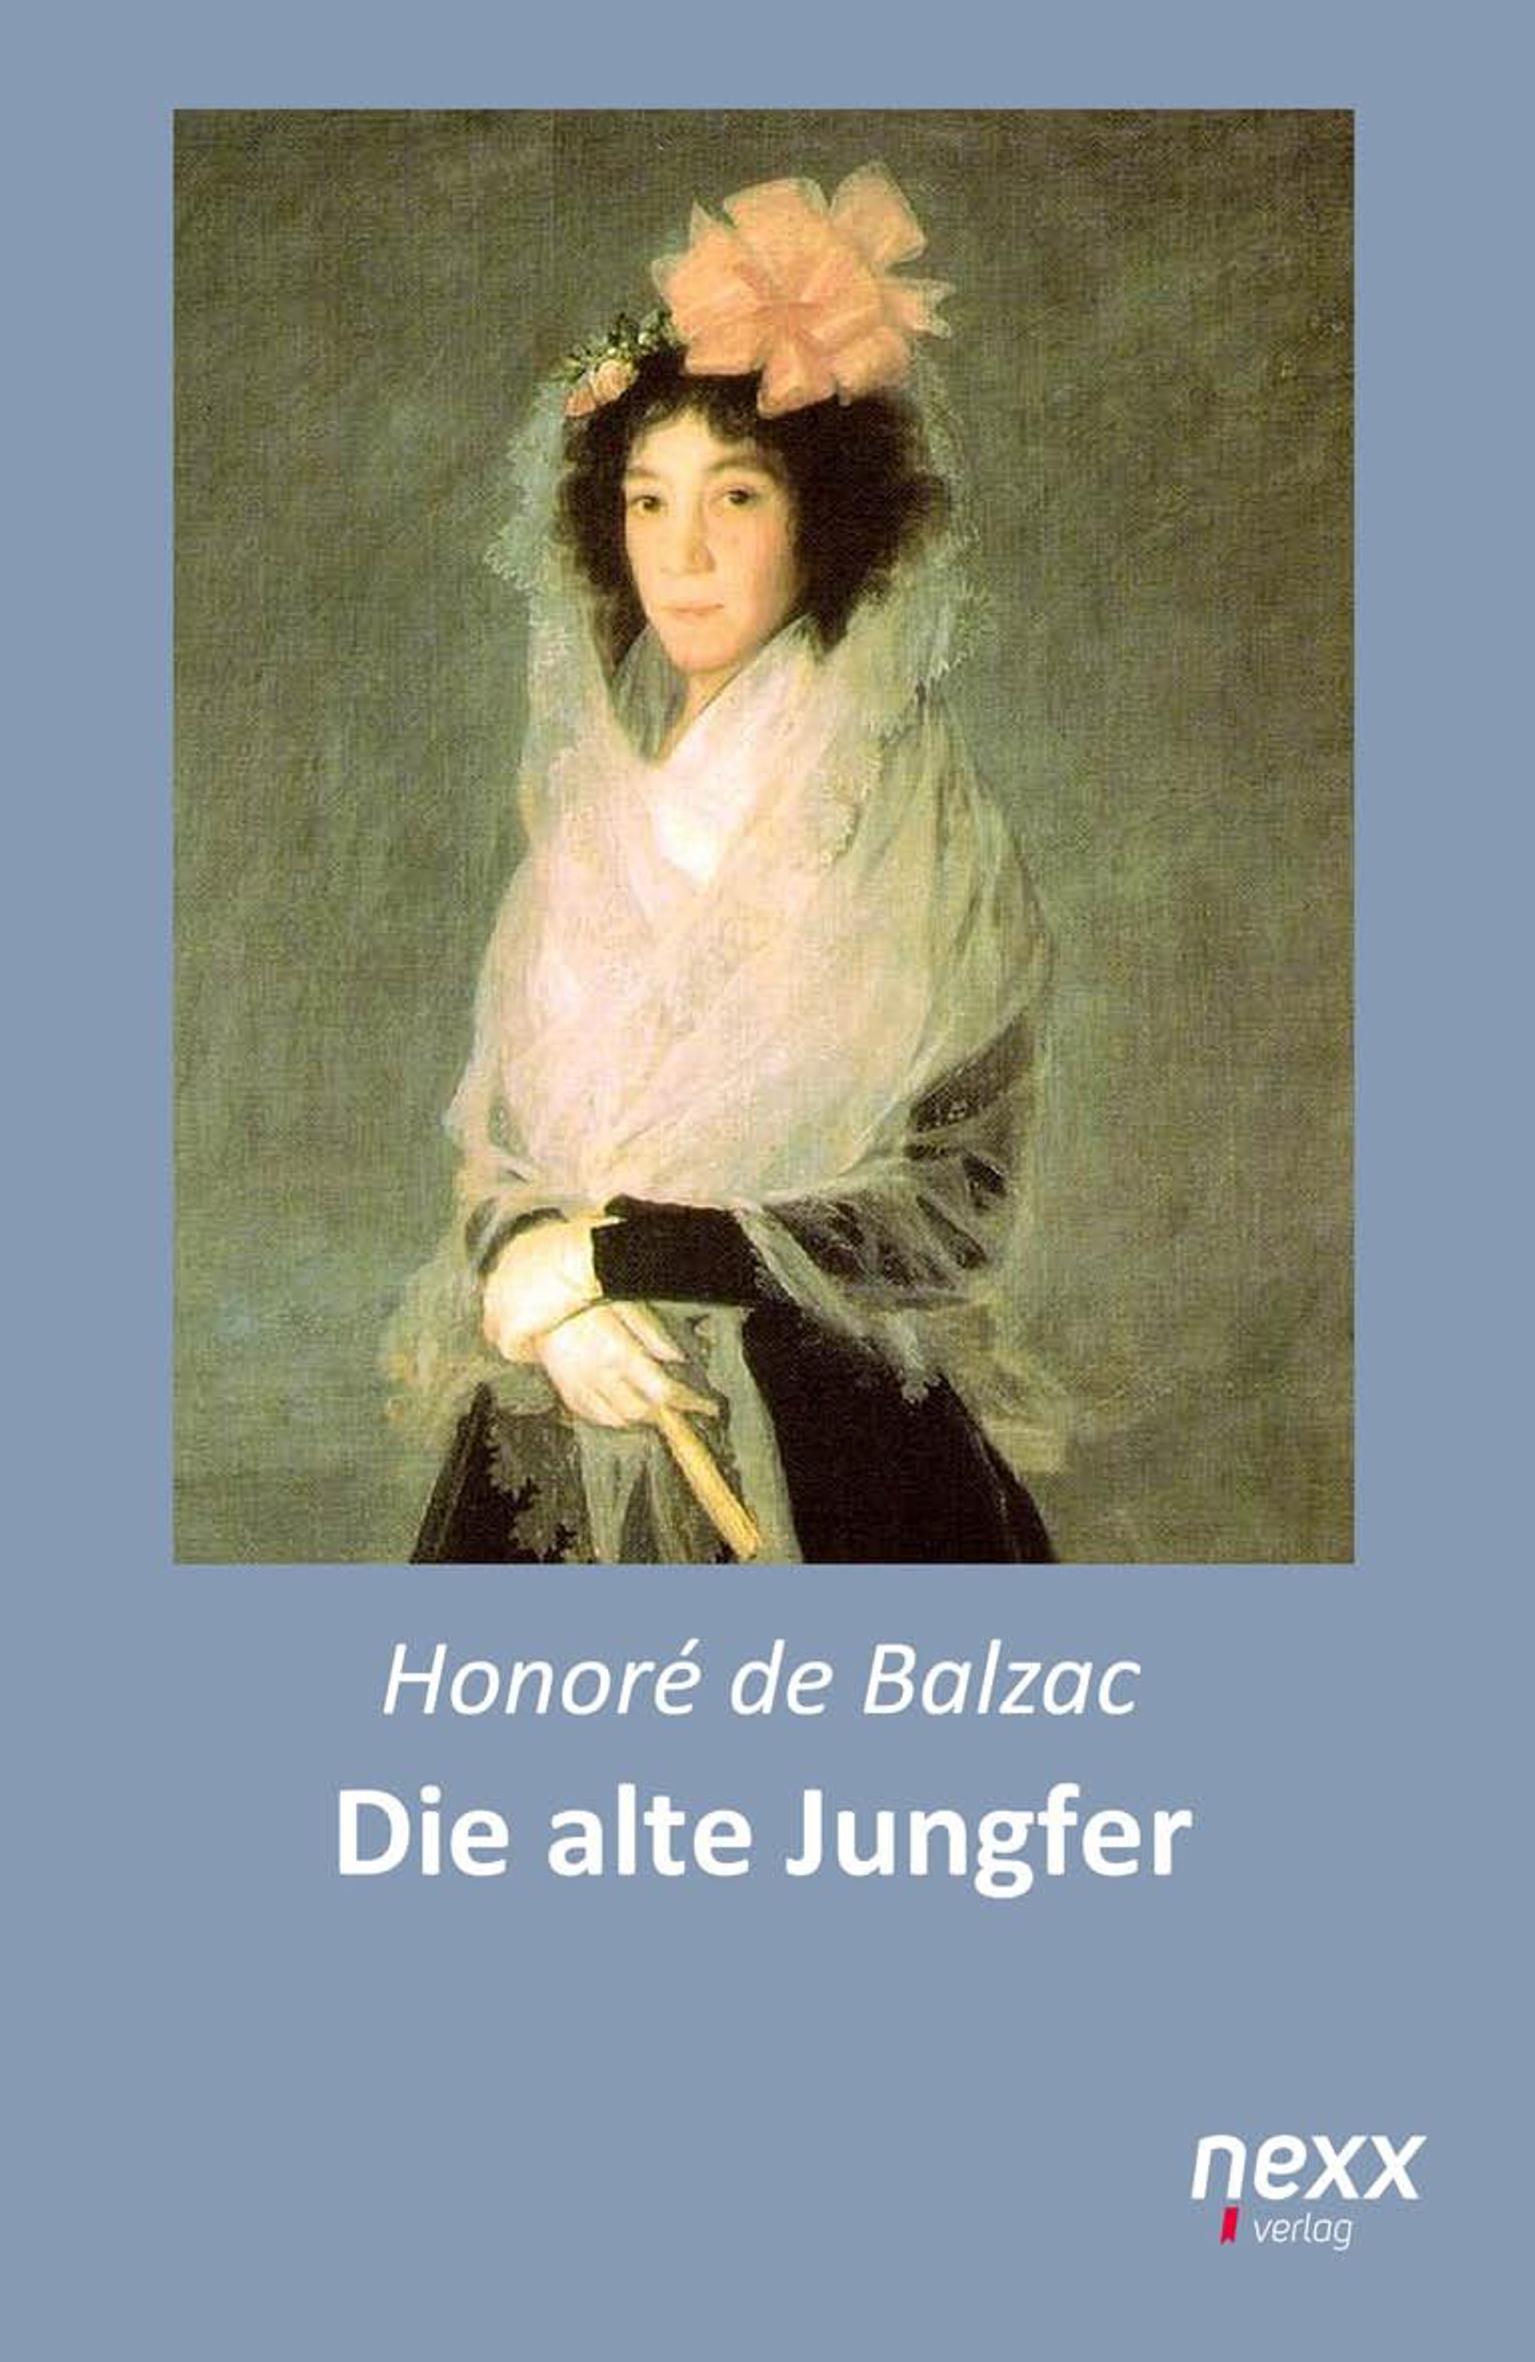 Die alte Jungfer  Honoré de Balzac  Taschenbuch  Deutsch  2017 - Balzac, Honoré de